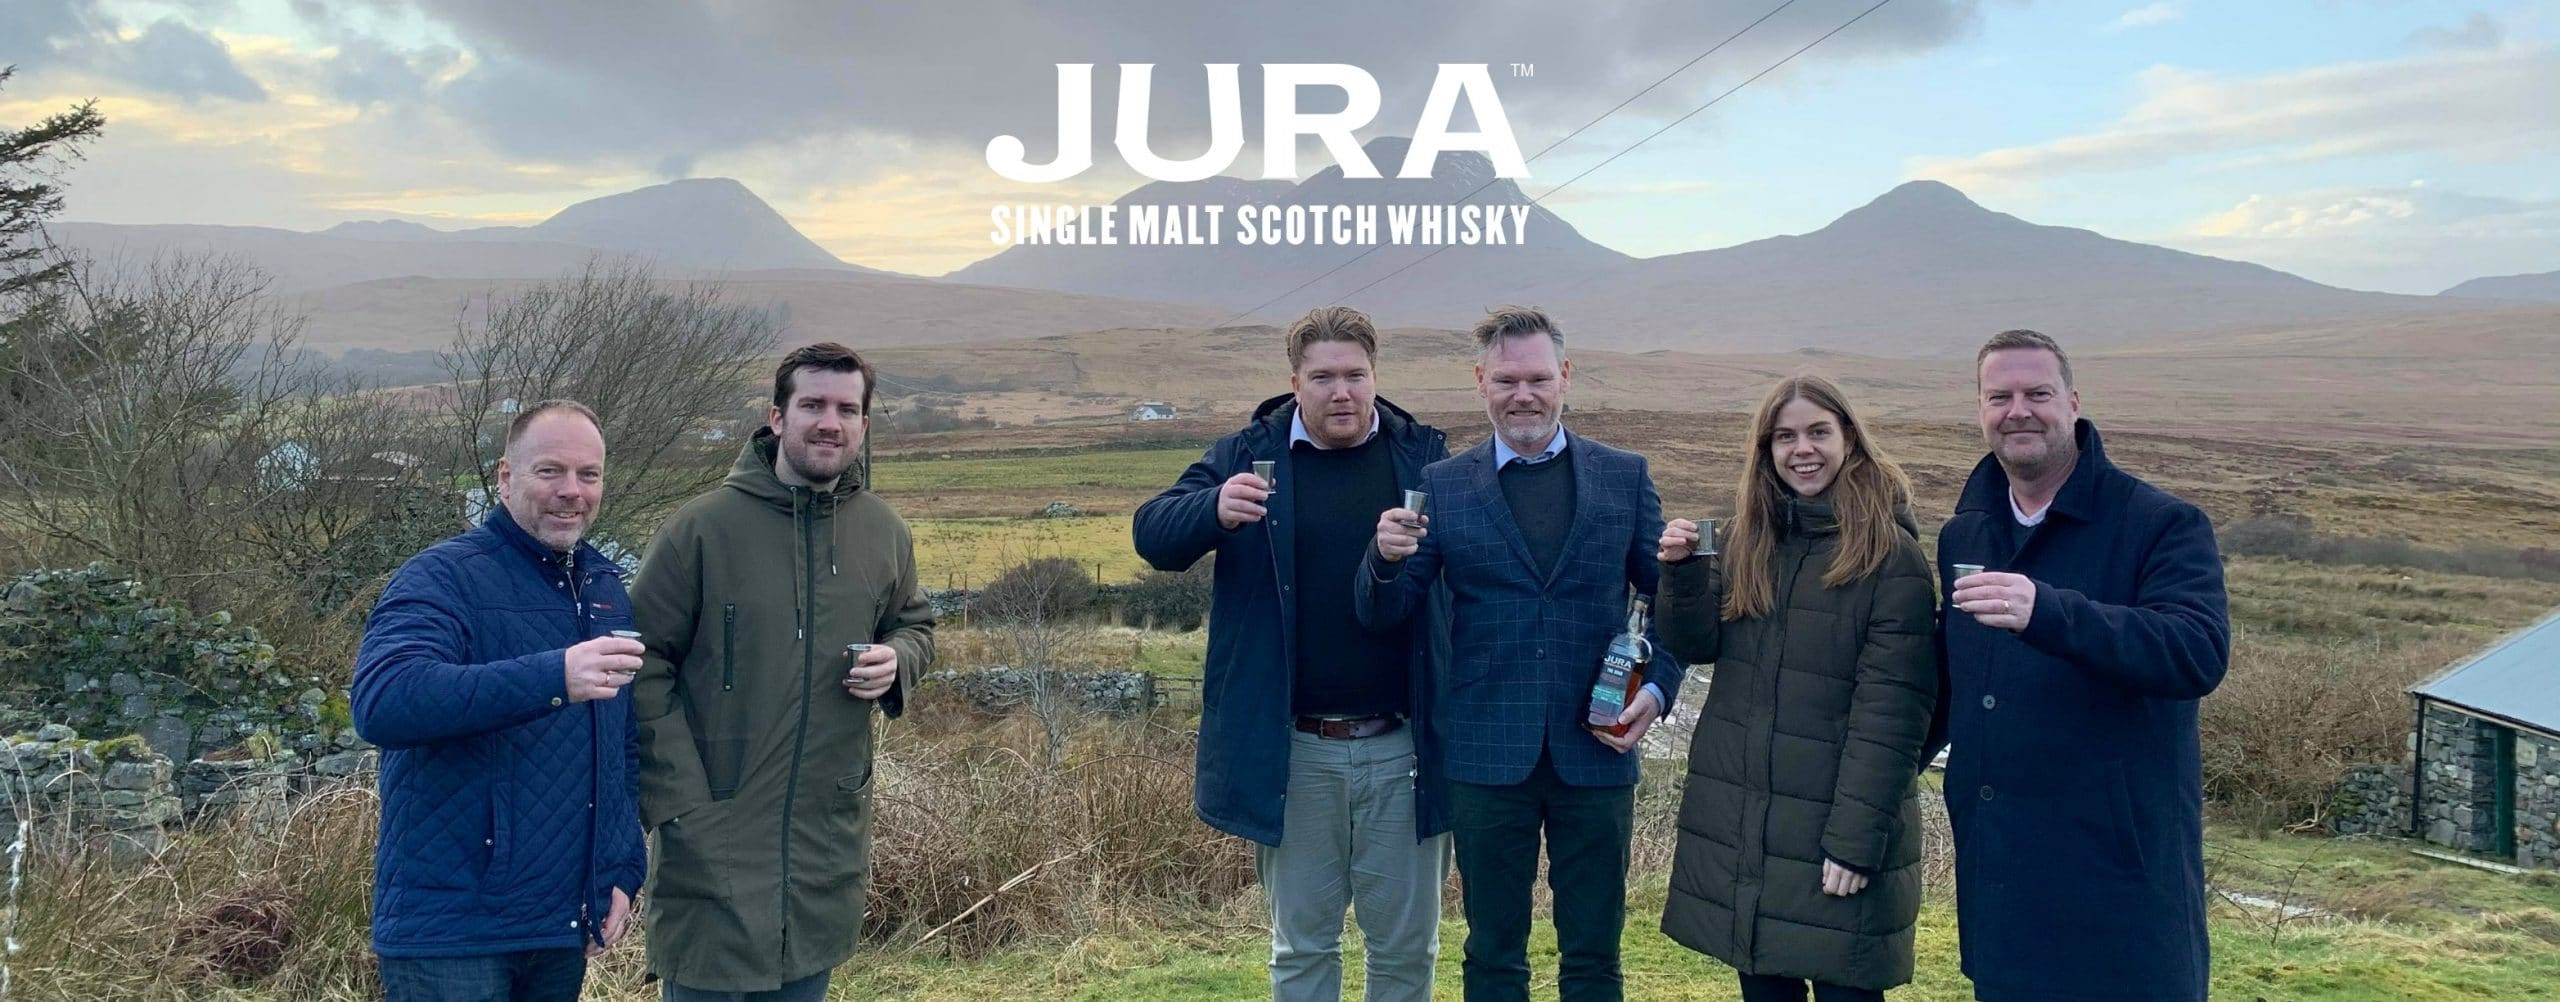 Interbrands Danmark besøger Jura Whisky